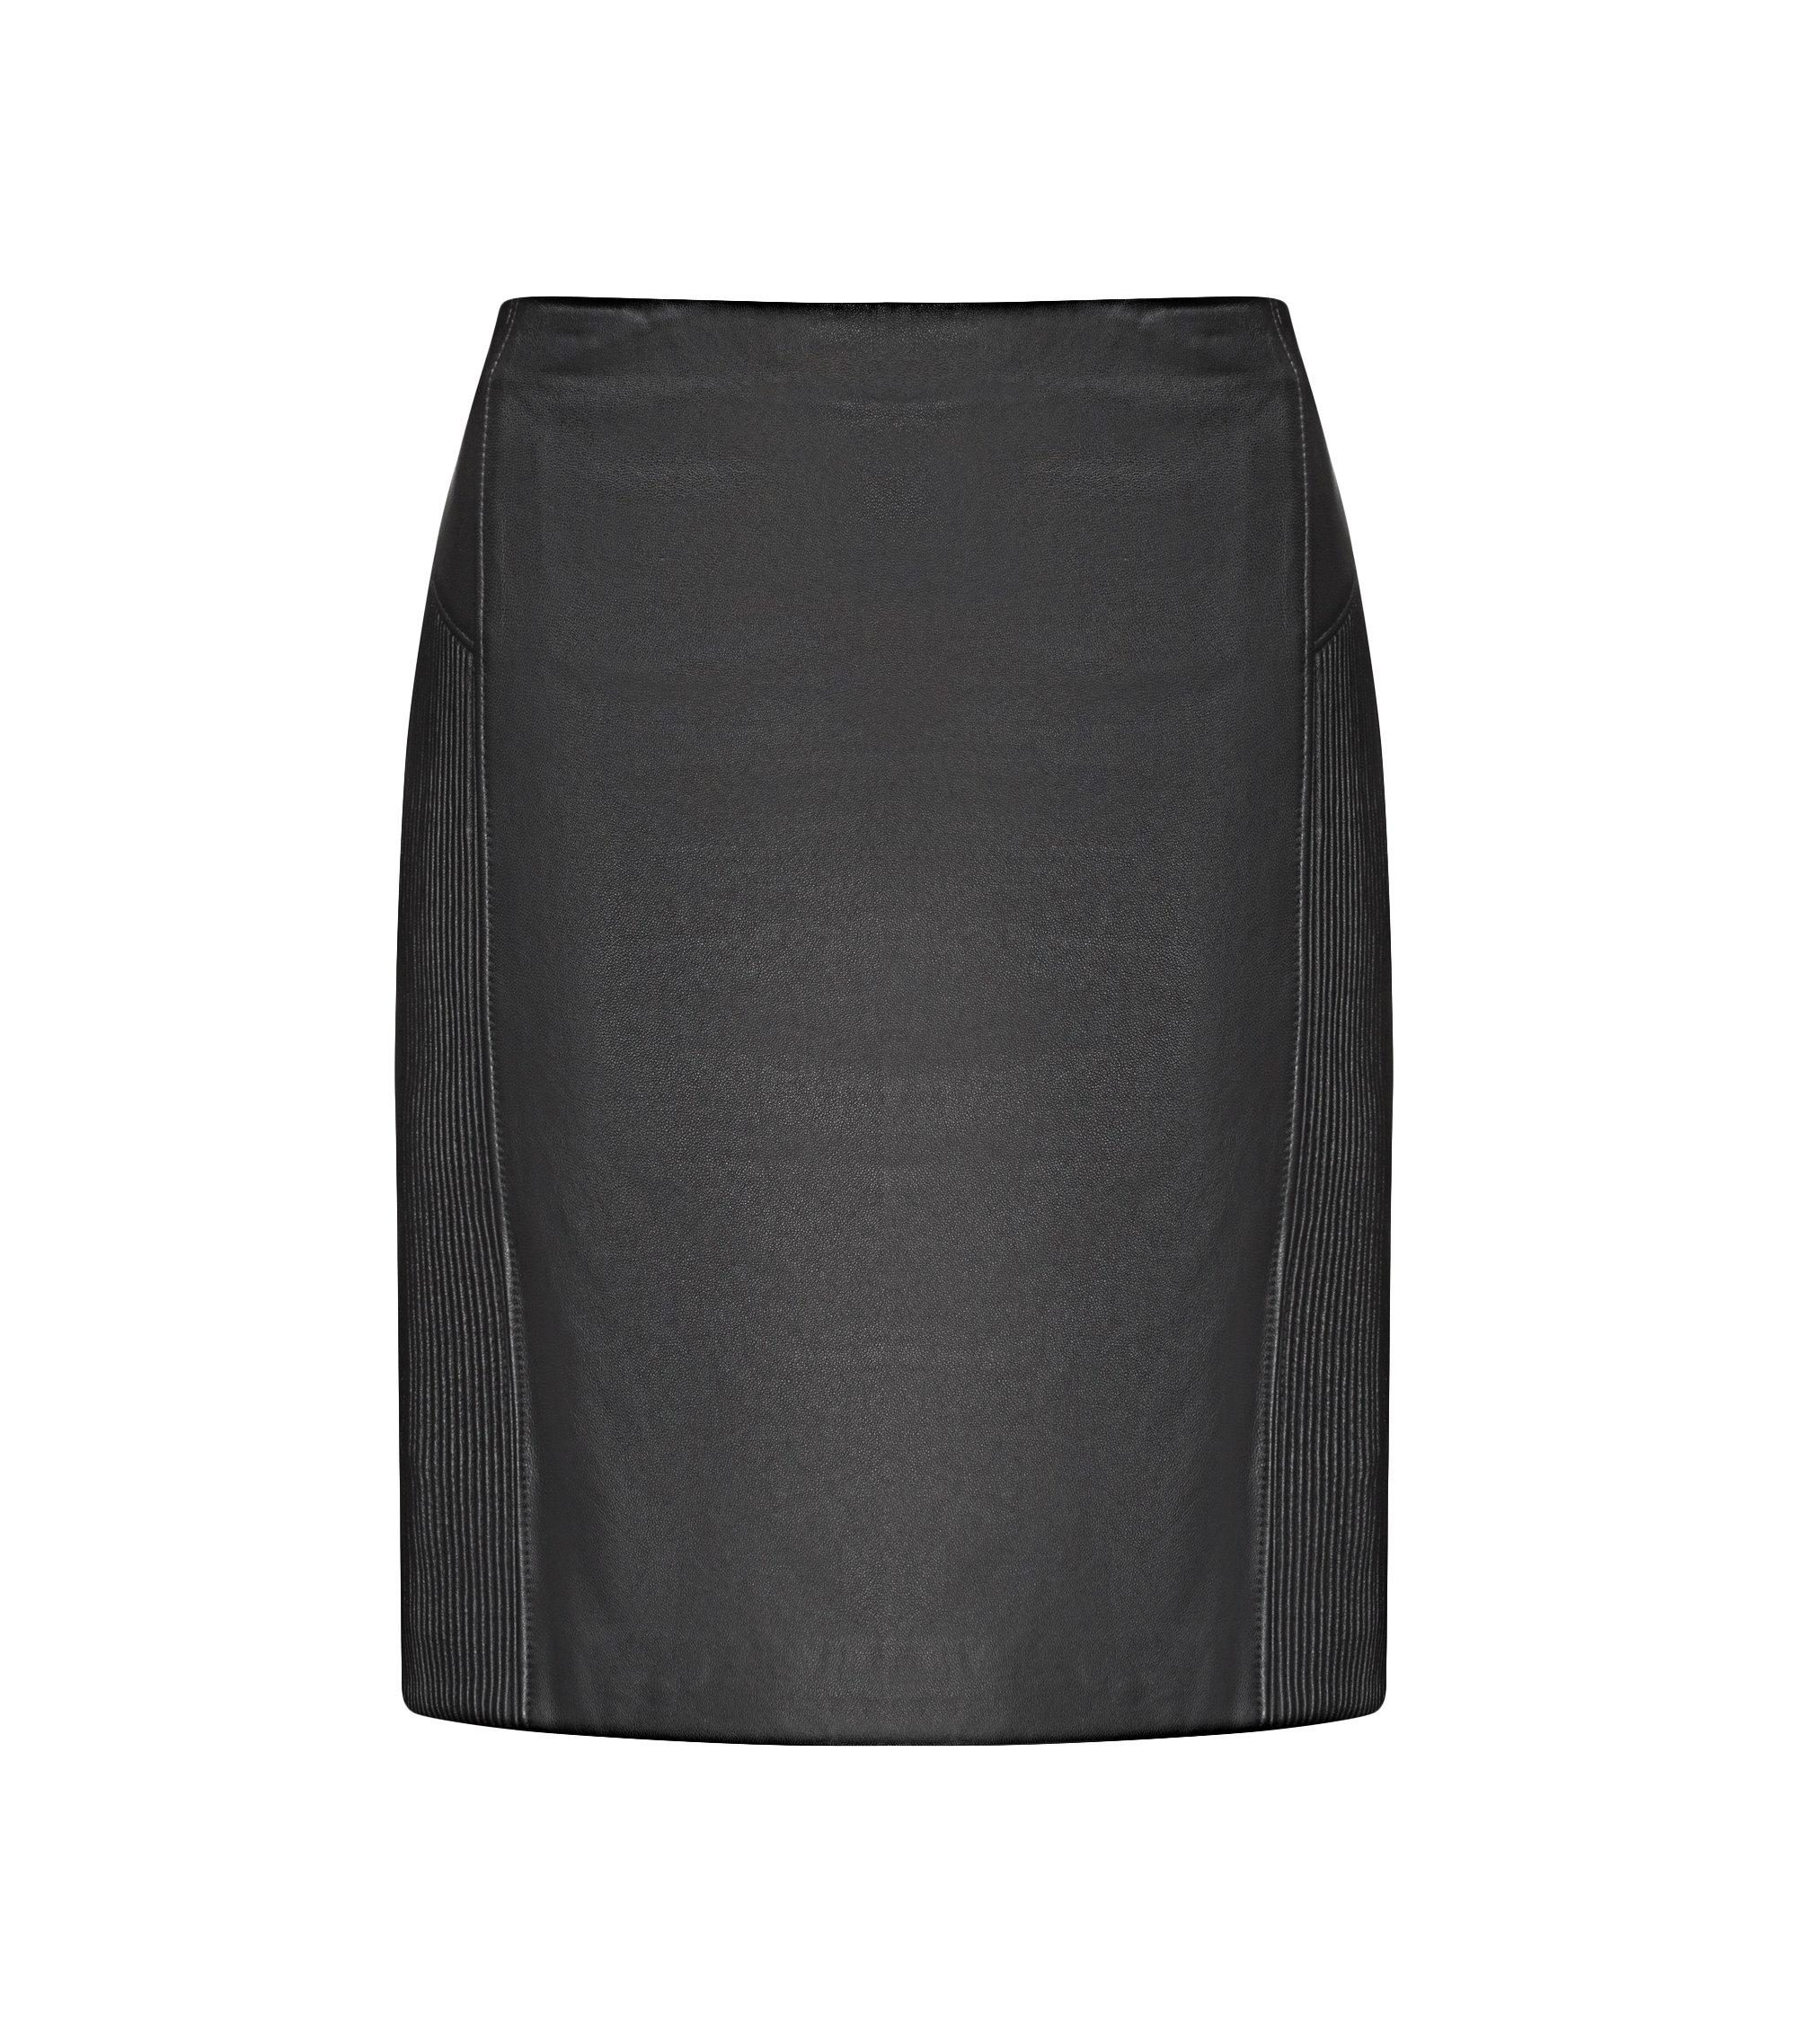 Falda lápiz plisada en piel de napa, Negro